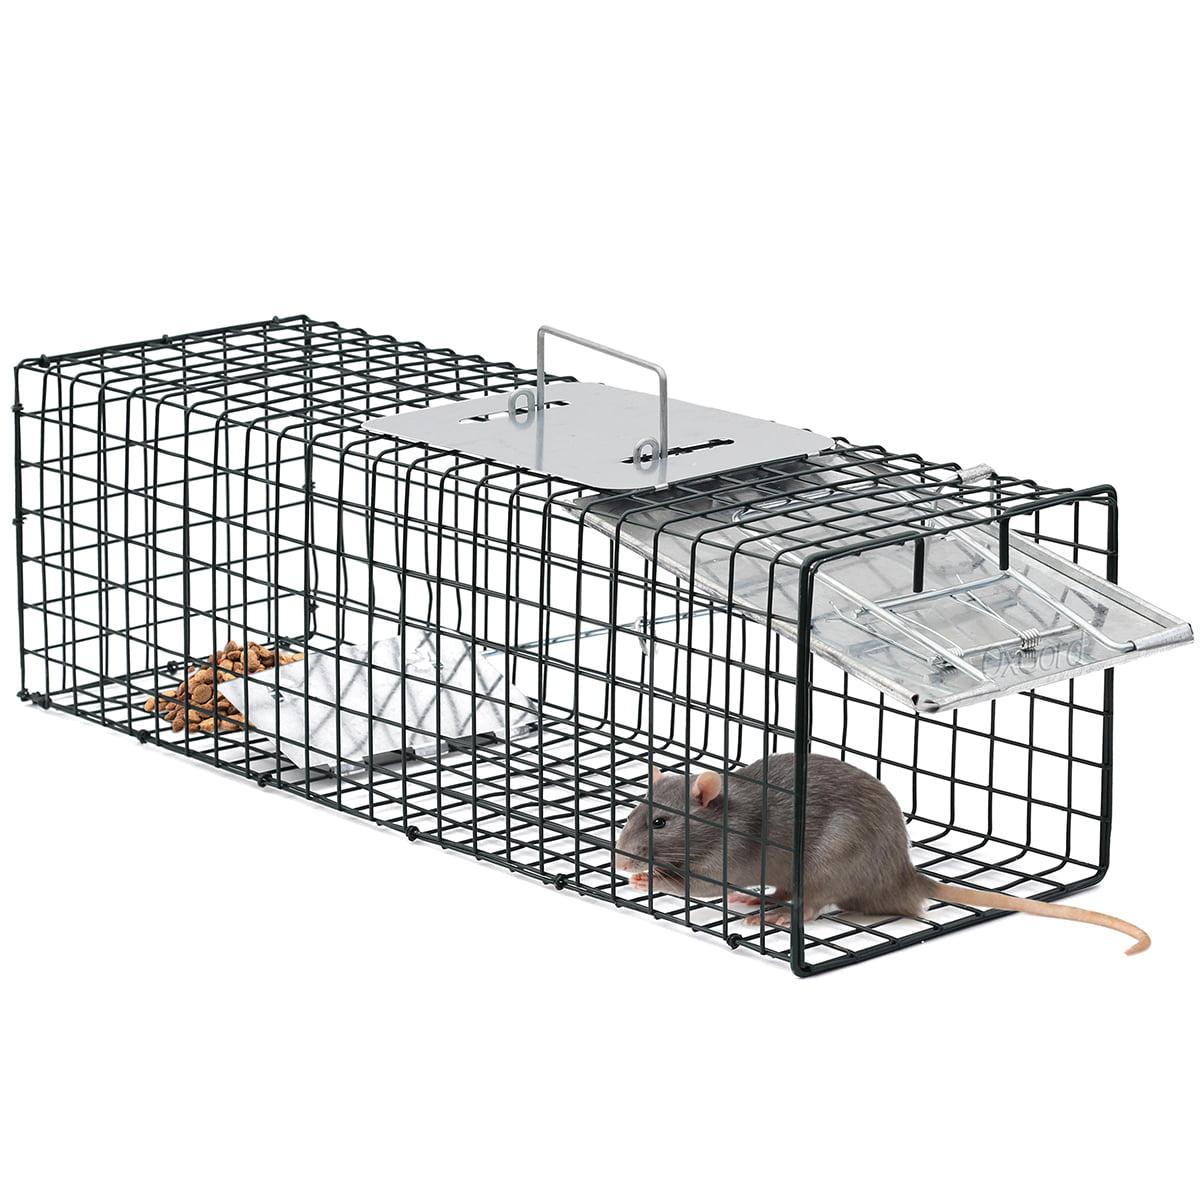 "OxGord Live Animal Trap 24"" X 7"" X 7"" GFA Catch and Release Humane"